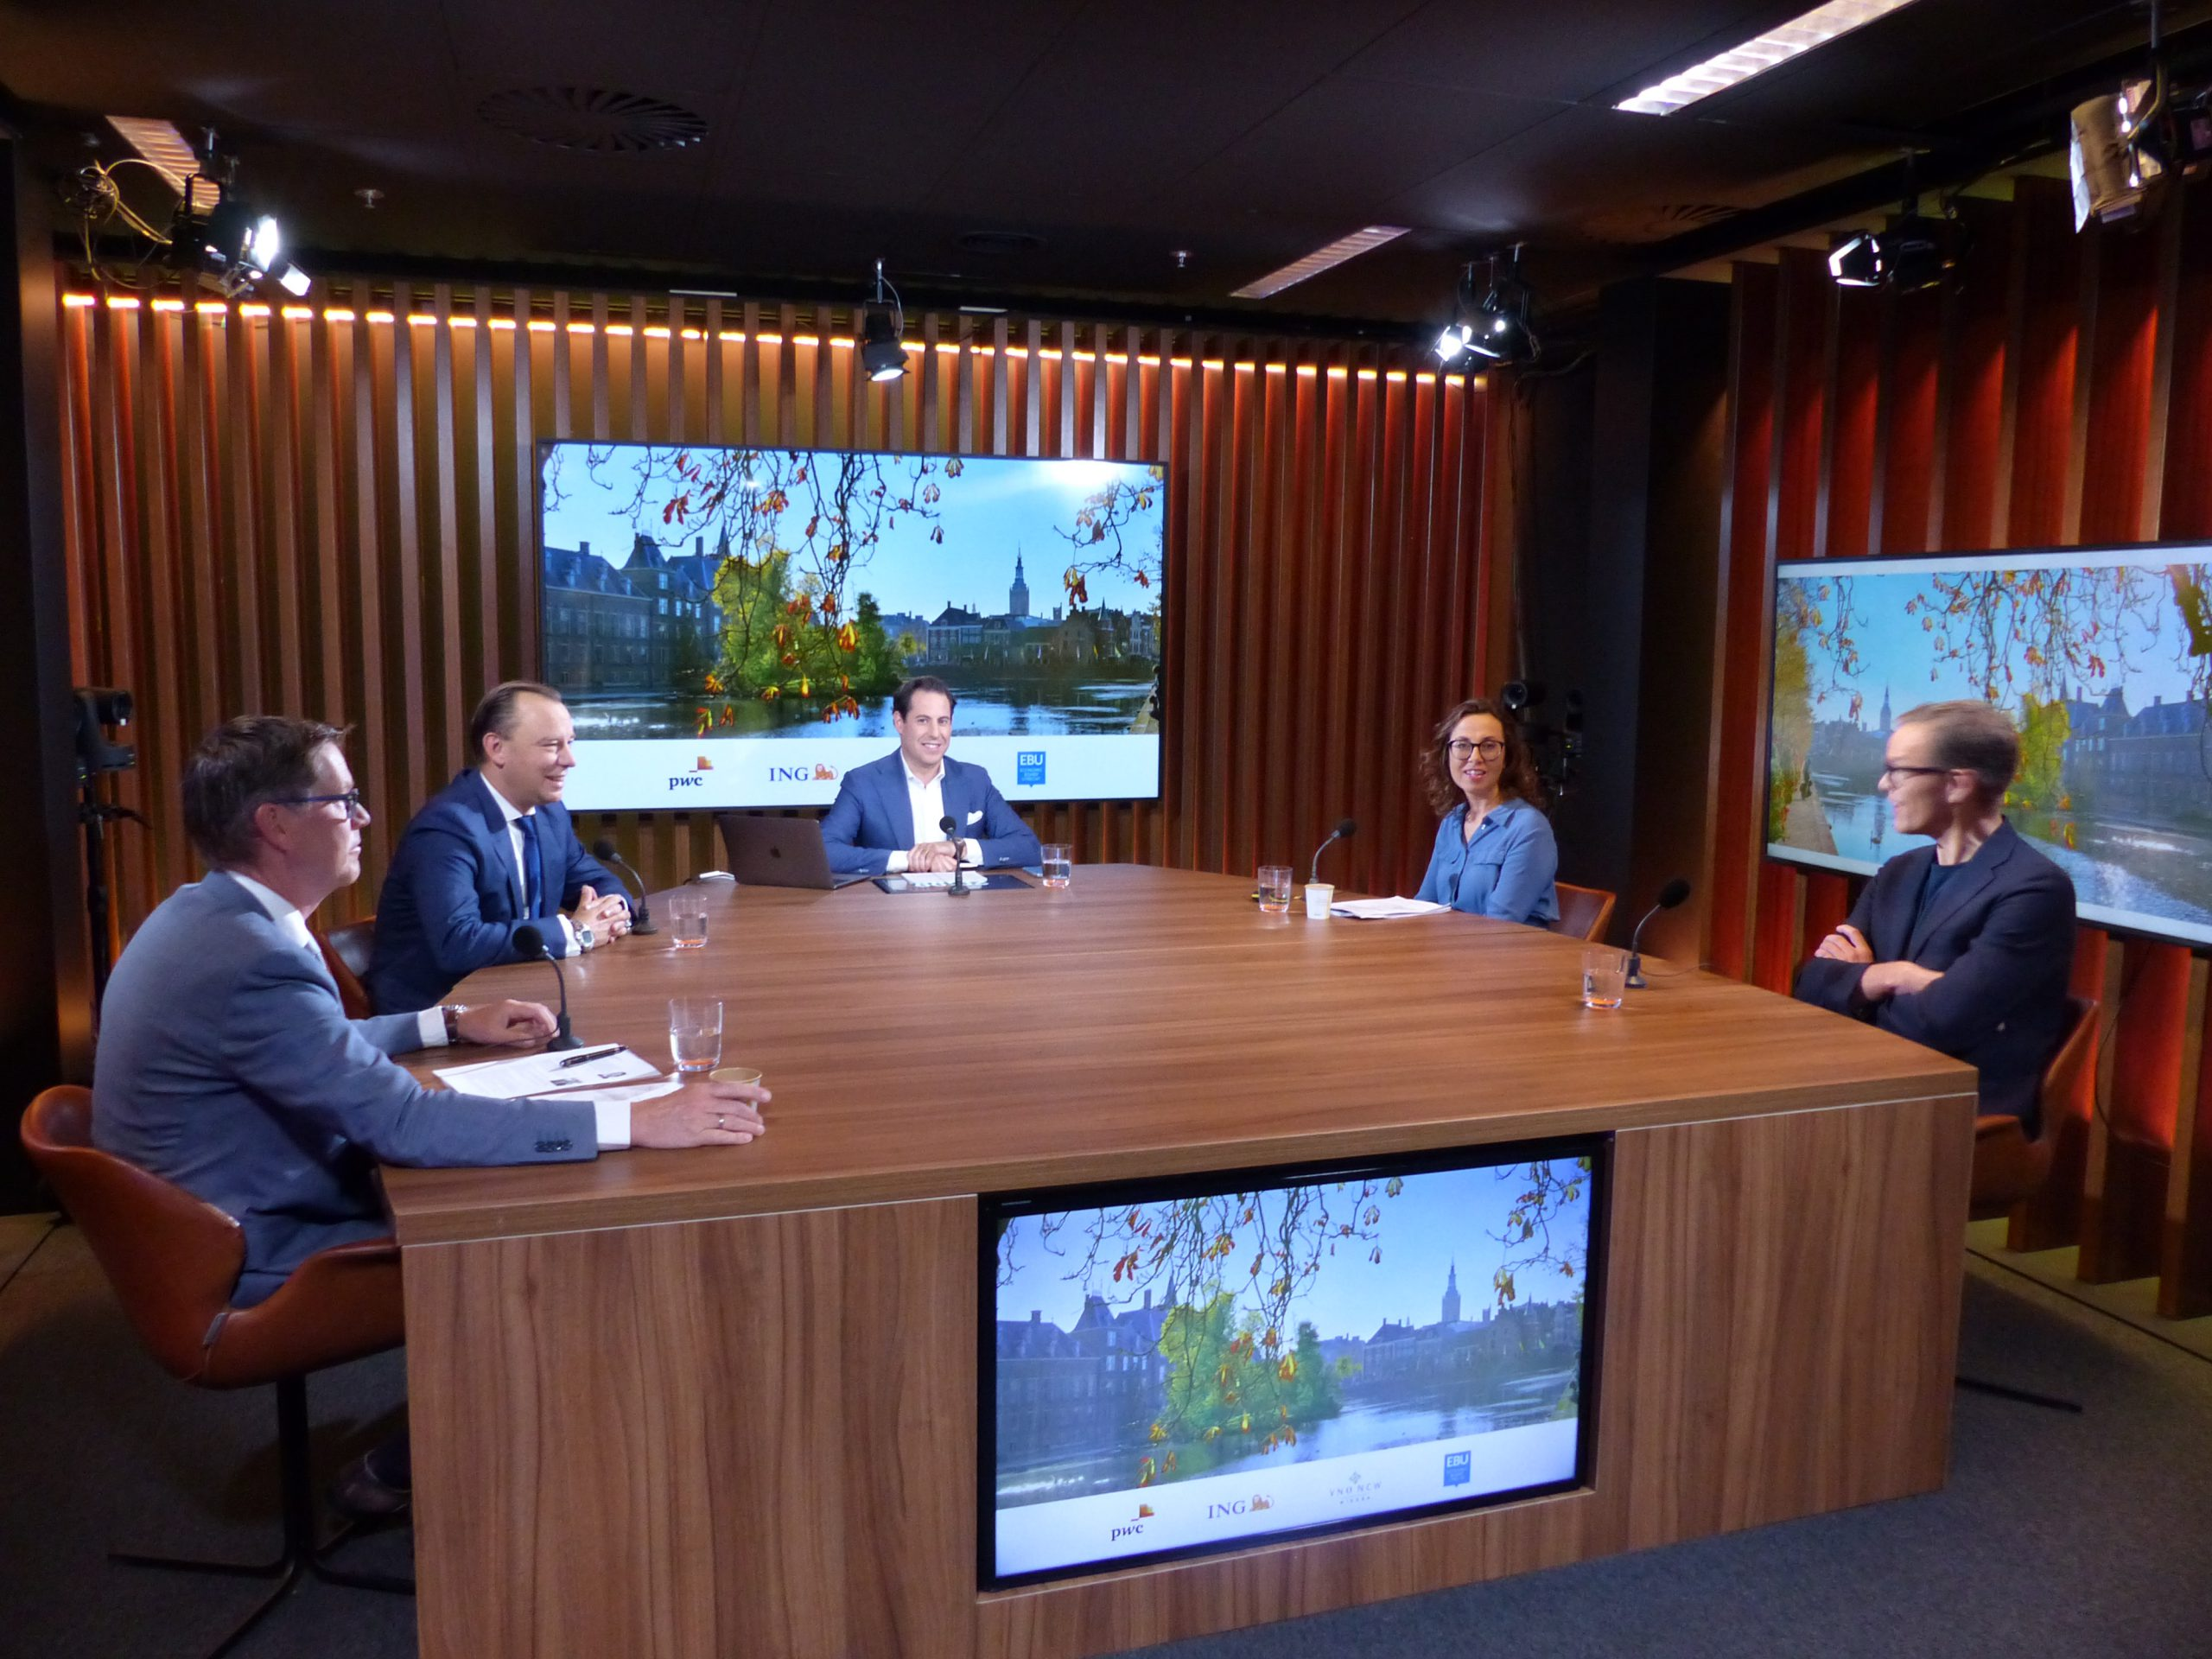 Miljoenenontbijt Regio Utrecht: optimisme, kansen en investeren